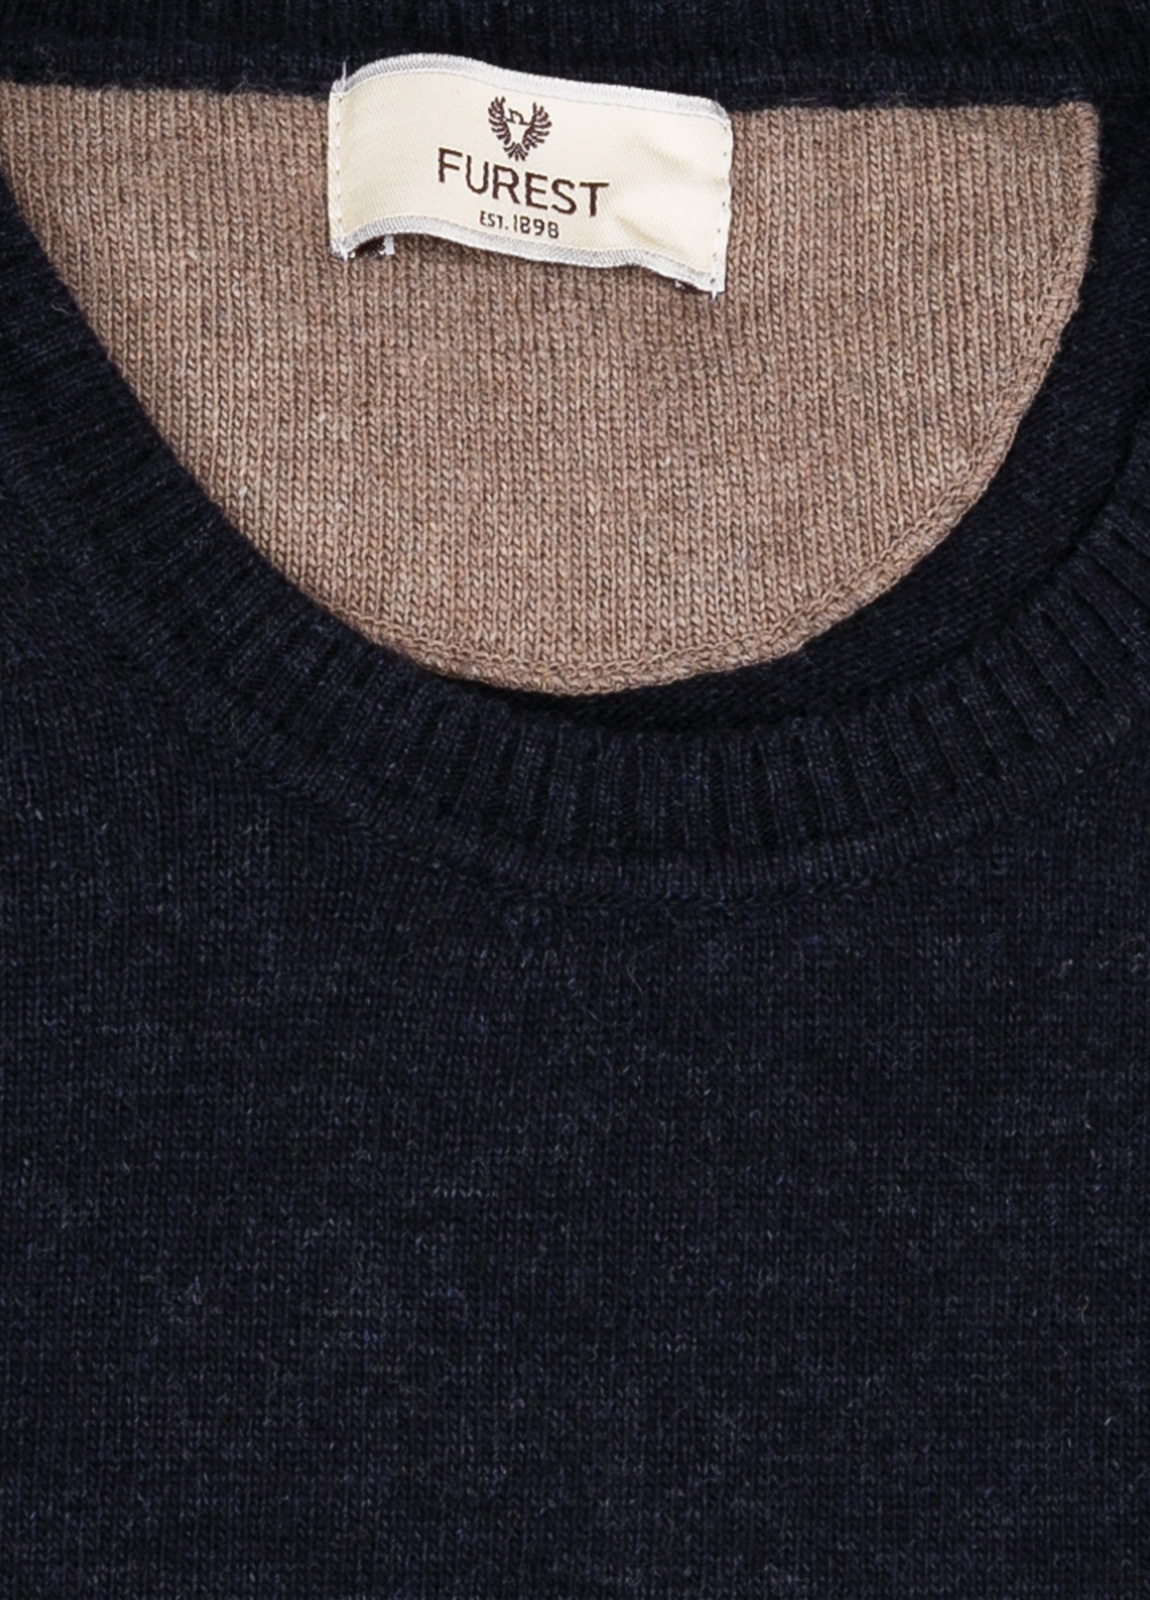 Jersey liso cuello redondo color azul marino, 40% lana merino, 20% viscosa, 10% cachemire